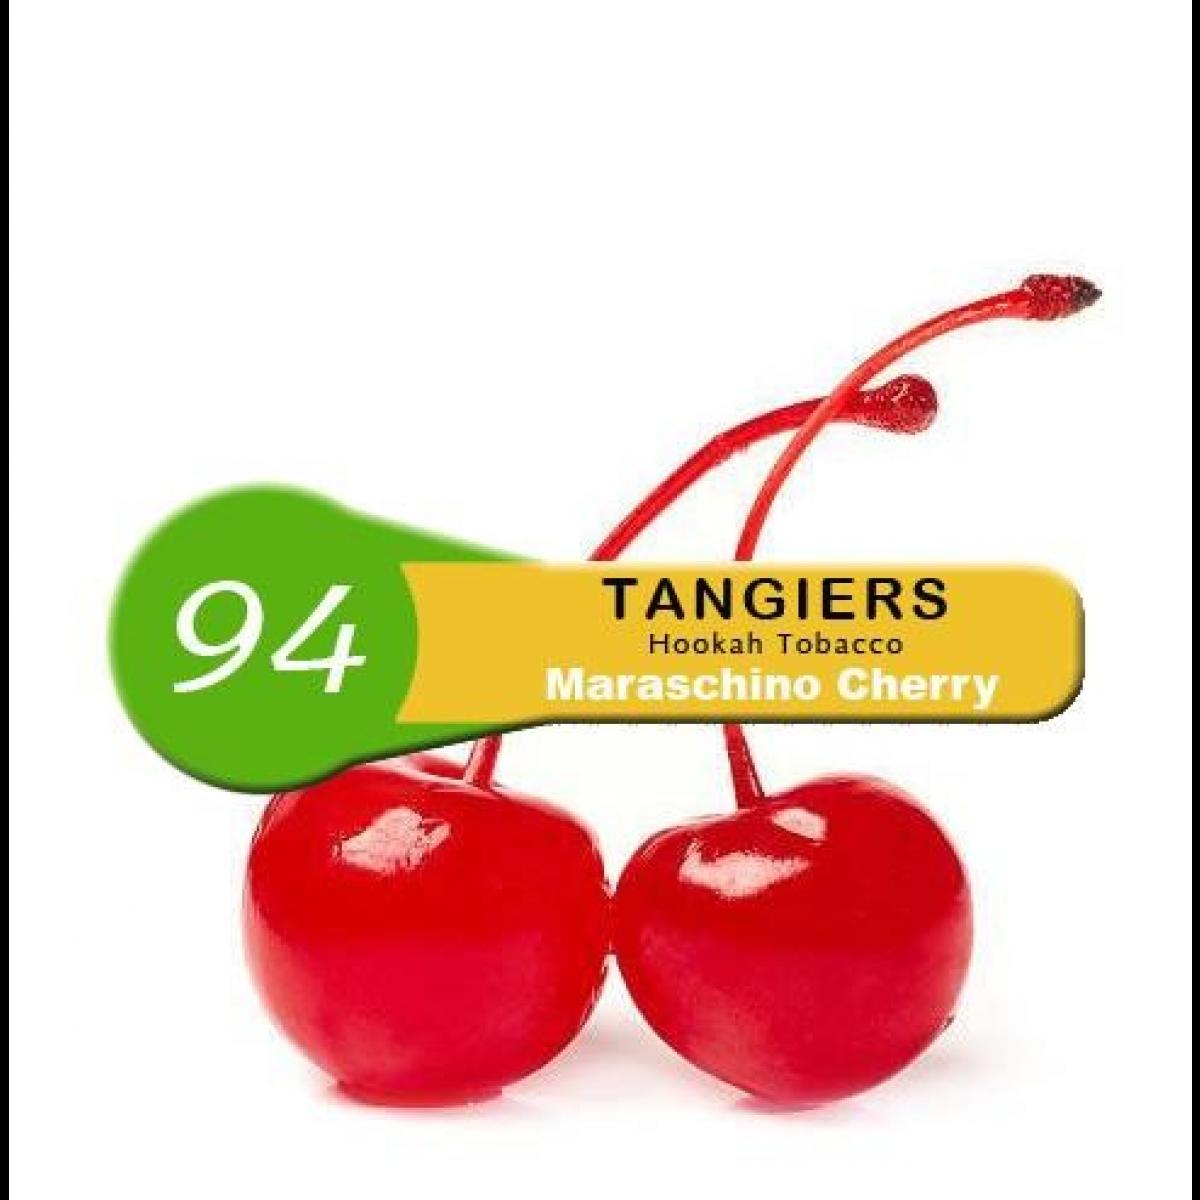 Табак Tangiers Noir Maraschino Cherry 94 (Танжирс Коктейльная вишня) 250 грамм